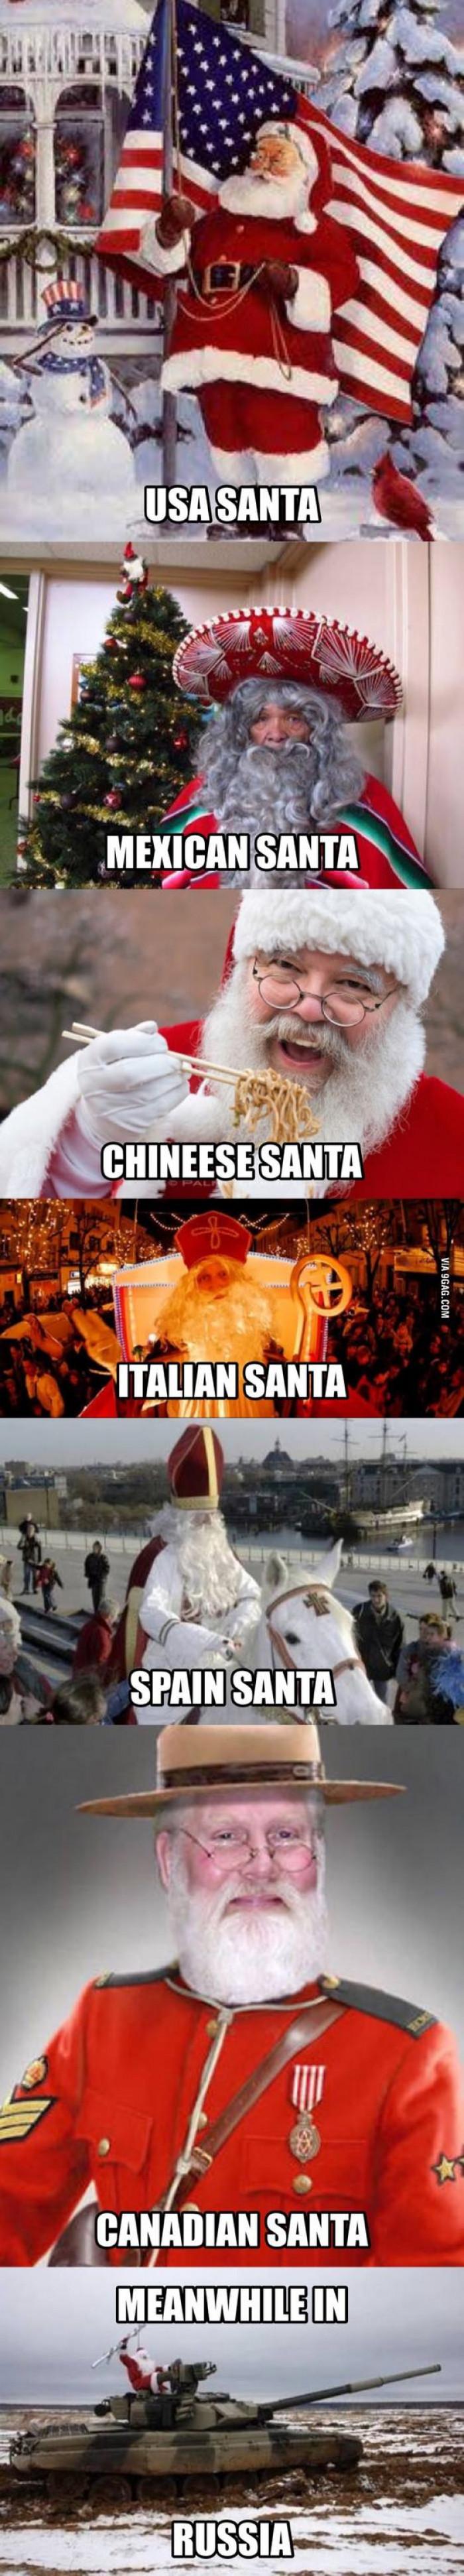 Different Kinds Of Santas